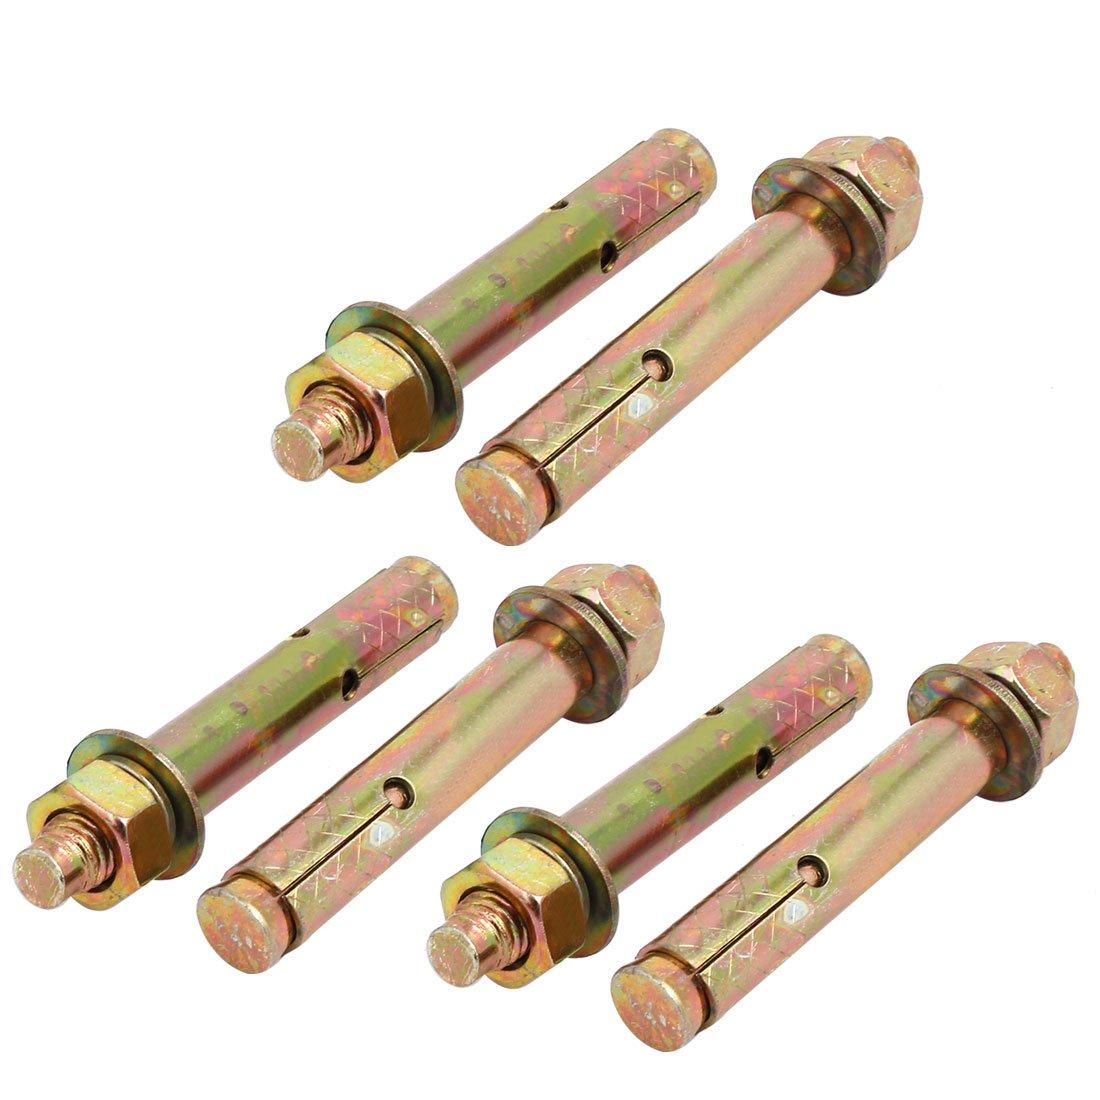 uxcell M12x100mm Zinc Plated Sleeve Anchor Expansion Bolt Bronze Tone 6pcs